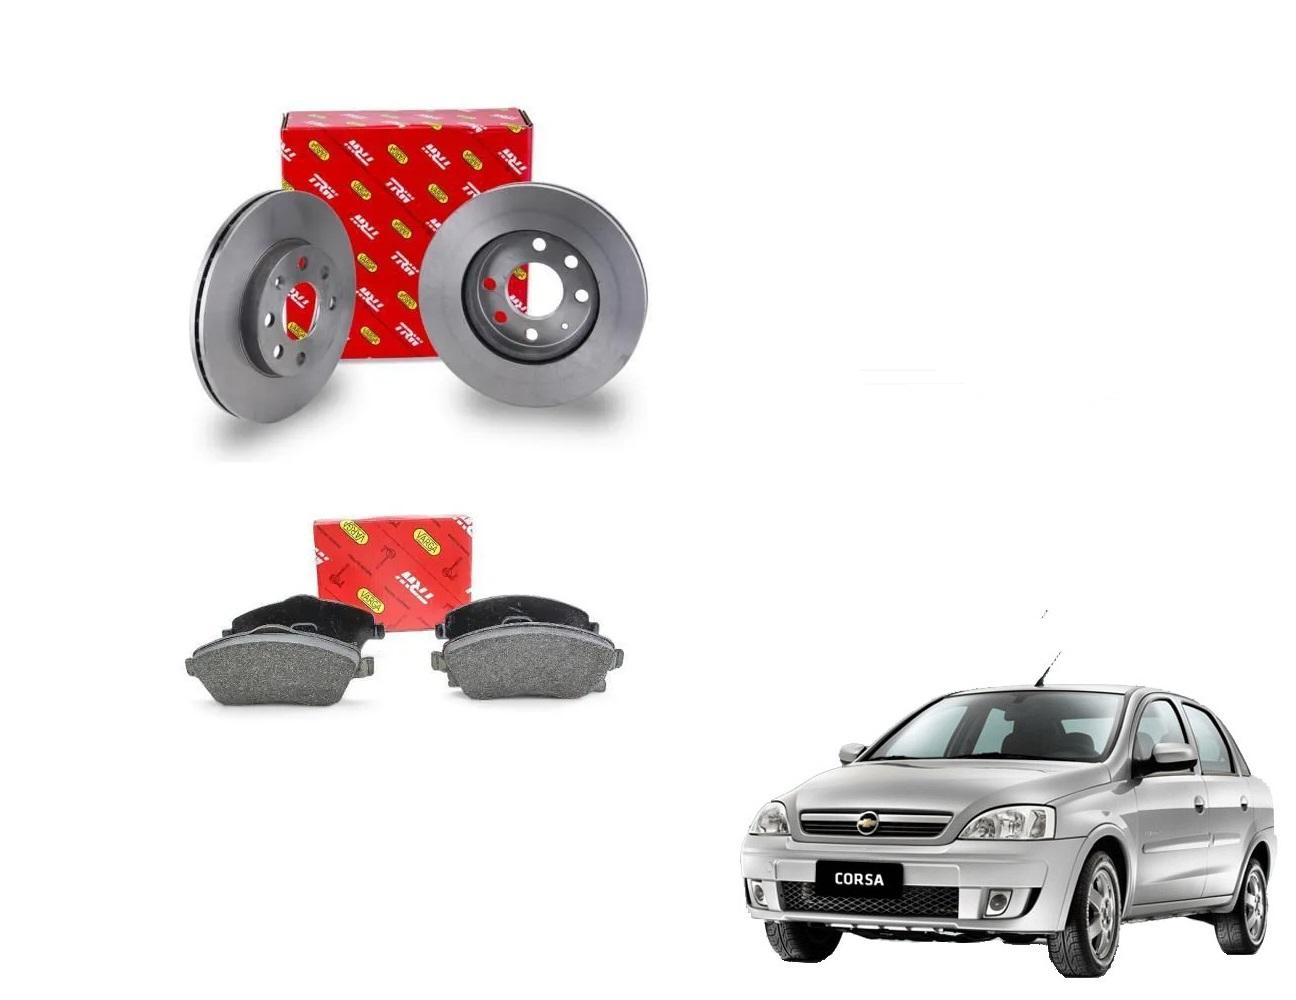 Kit freio dianteiro- Dianteiro - Corsa novo 1.0/1.4 de 2002 a 2012